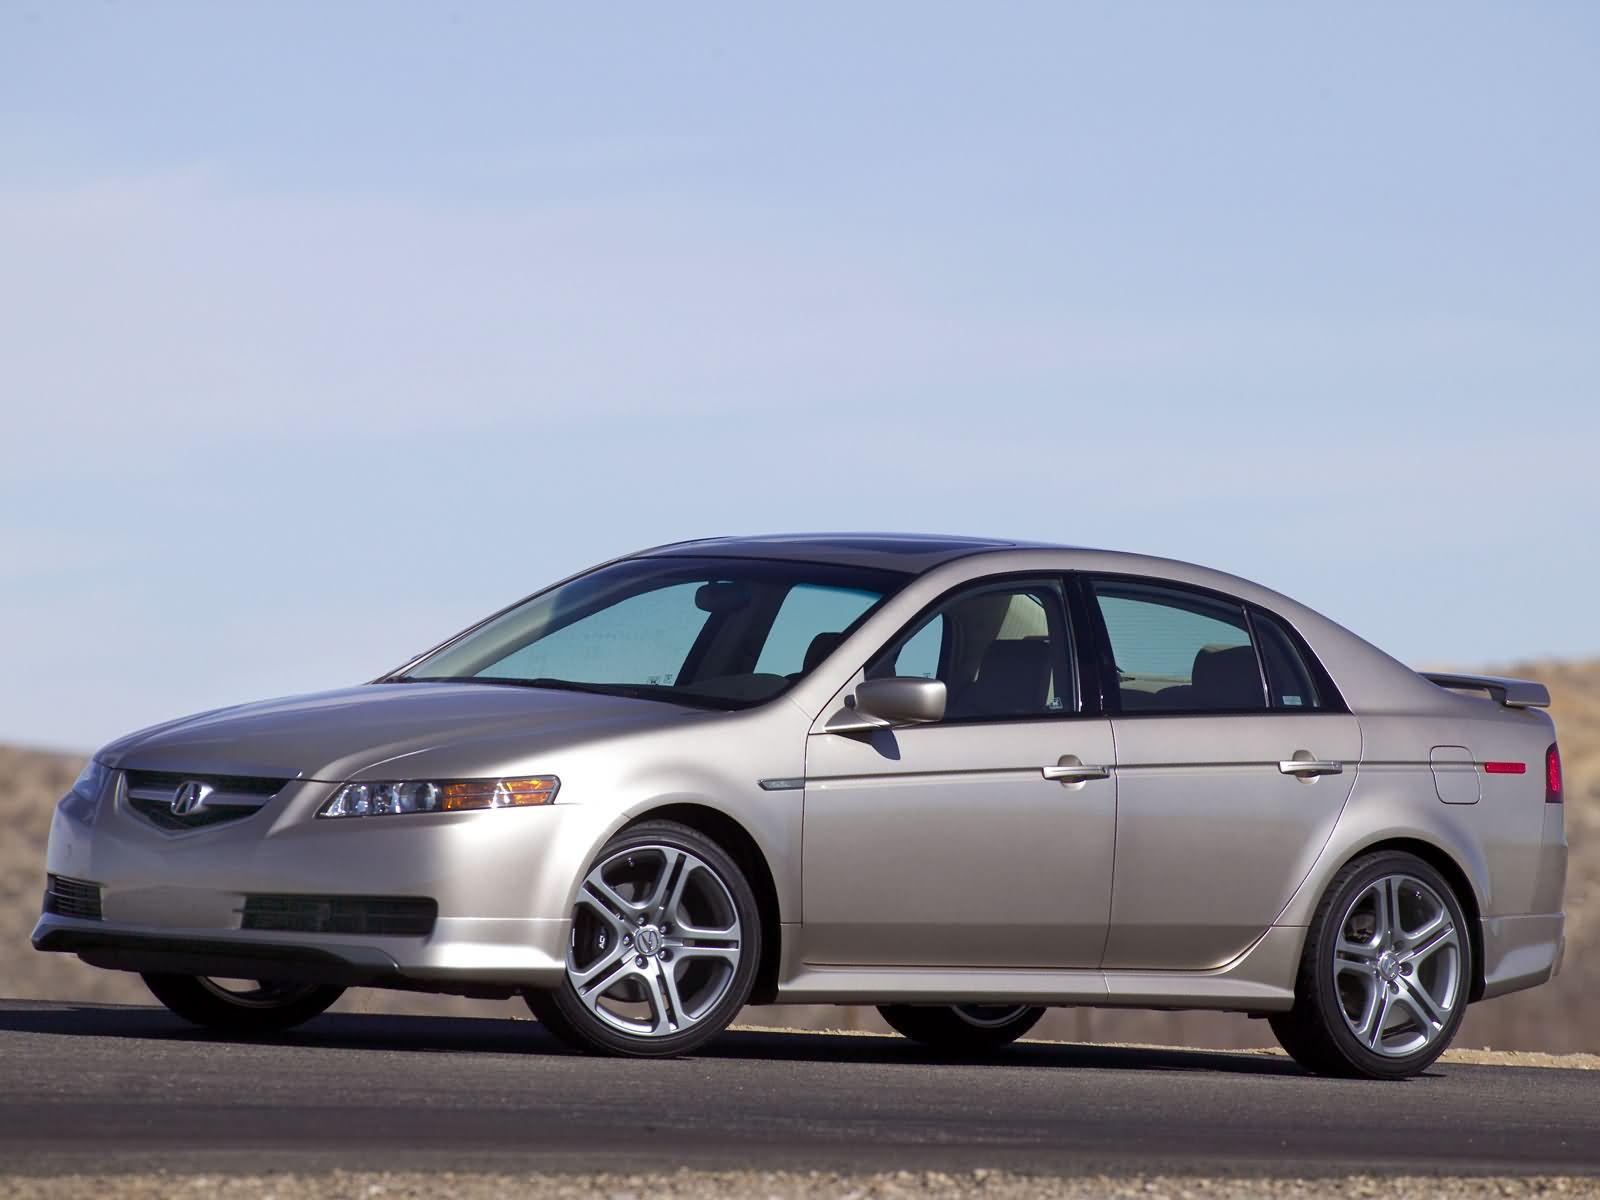 Acura TL A-SPEC photos - PhotoGallery with 39 pics| CarsBase.com